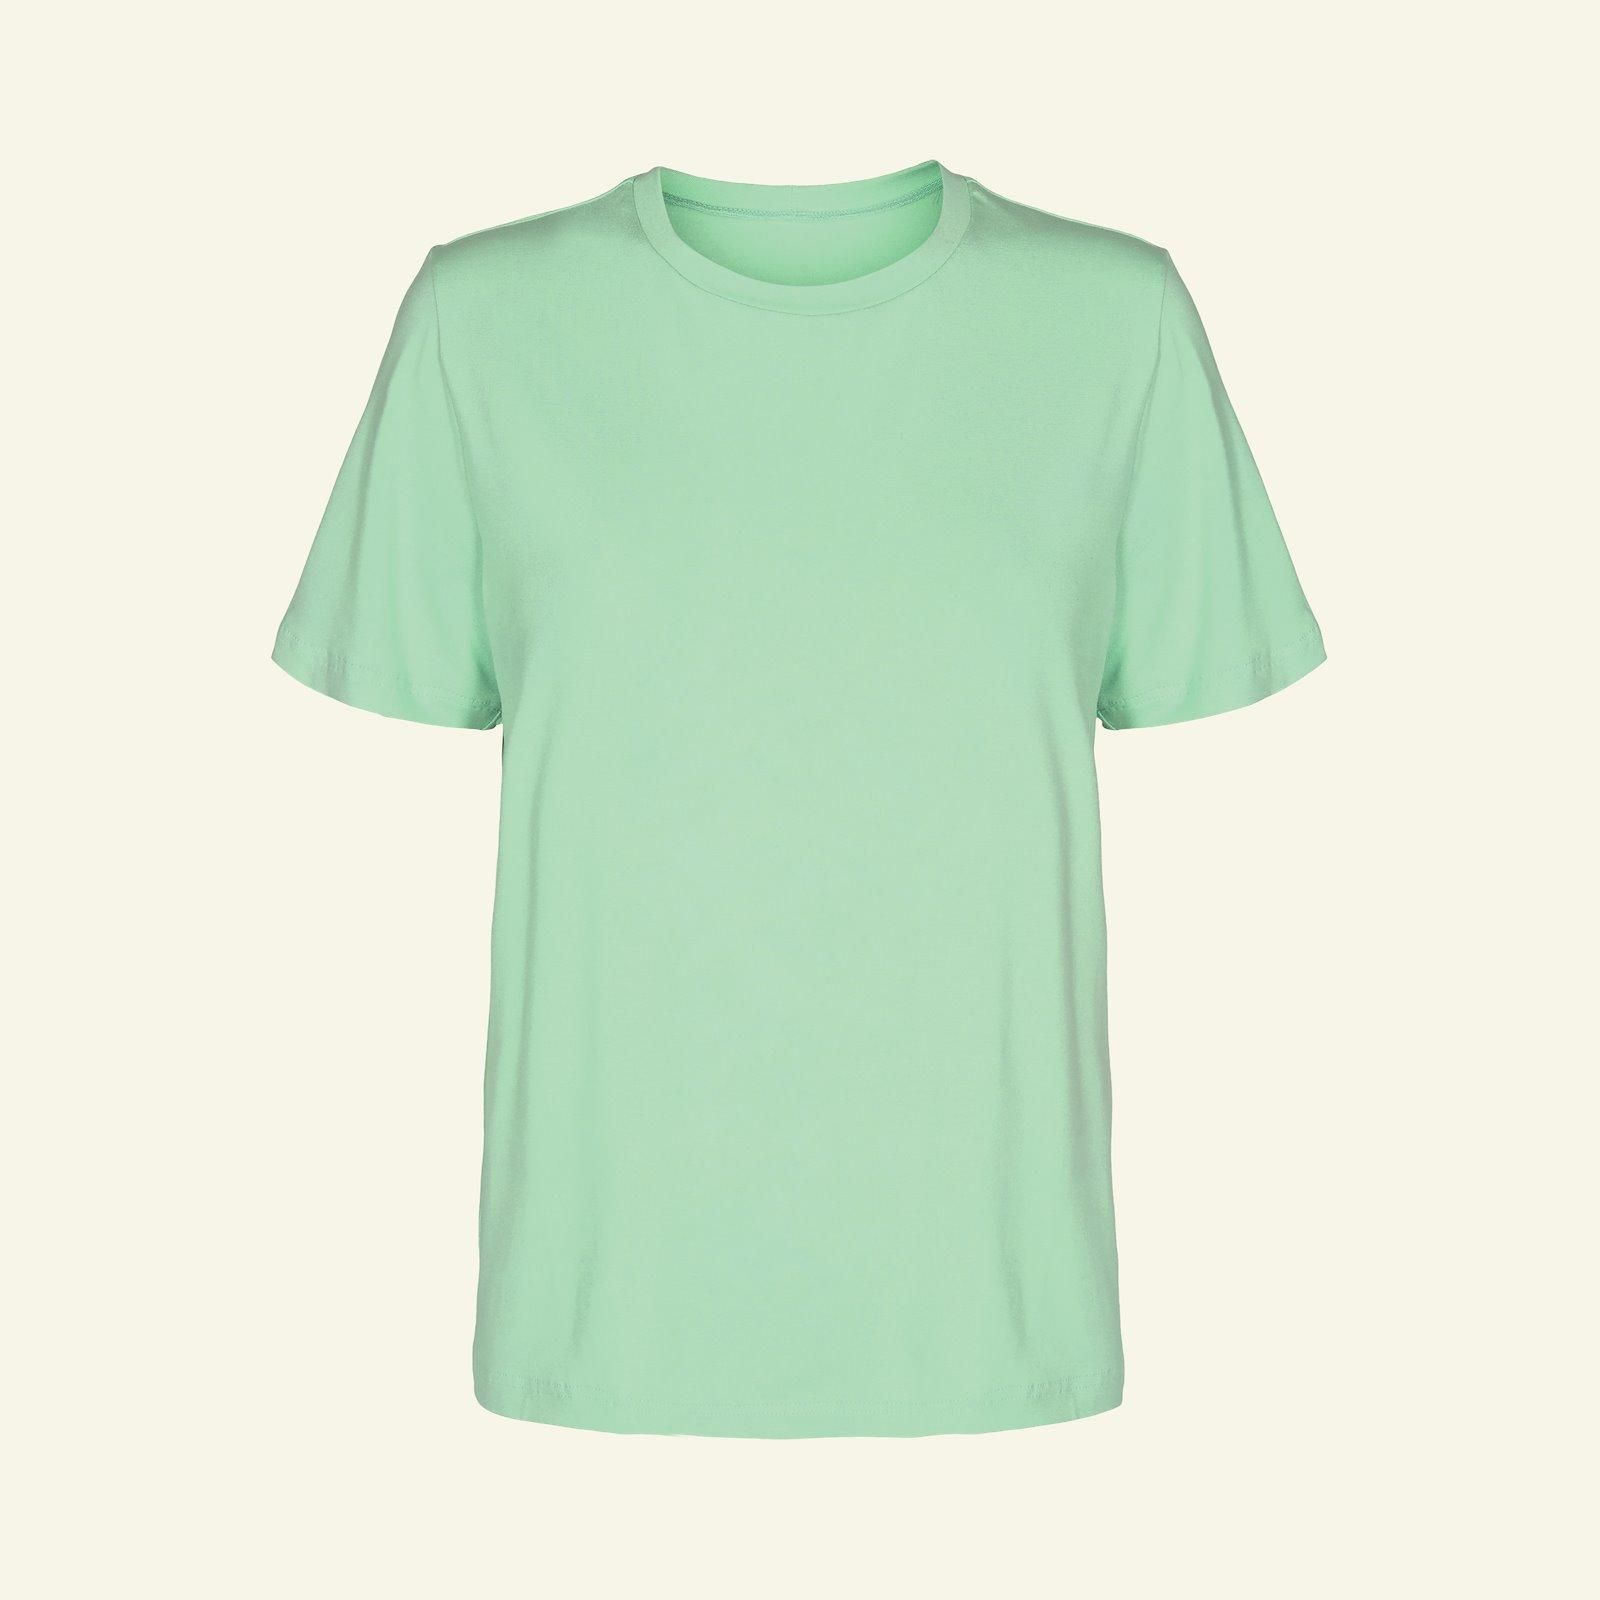 T-shirt and dress, 34/6 p22070_272660_sskit